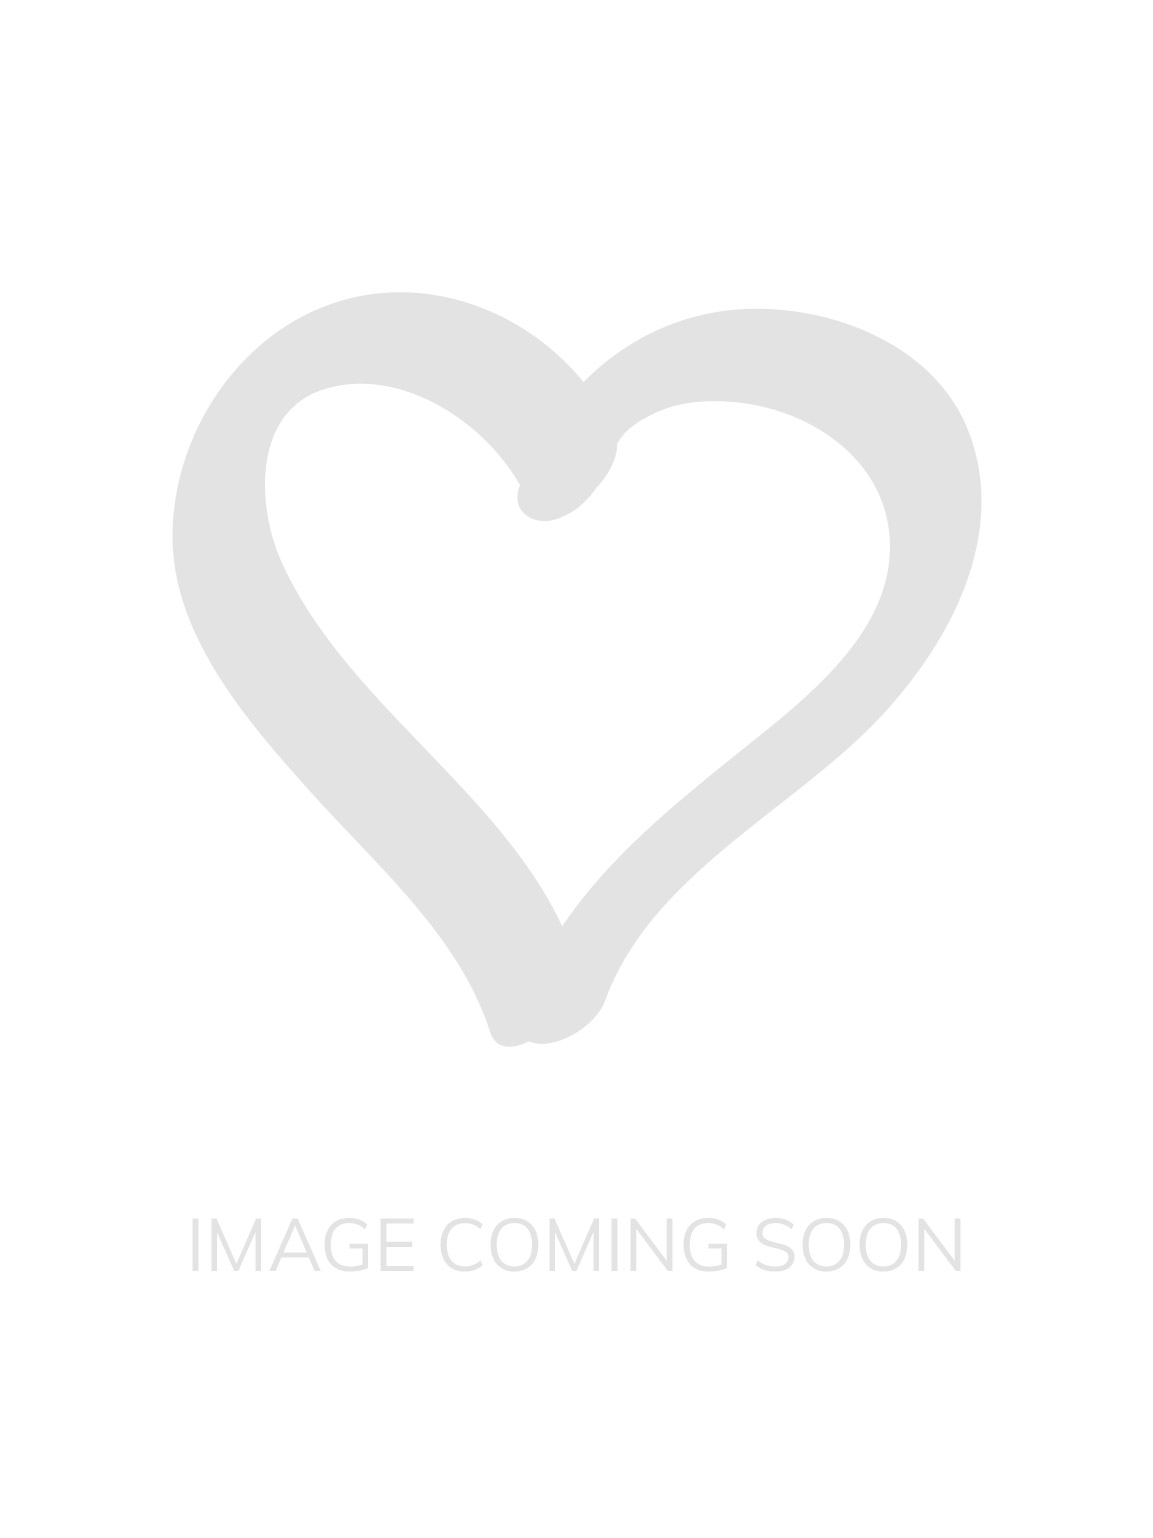 ebff4968c1 Body Make-up Soft Touch Longline Bra - Coral